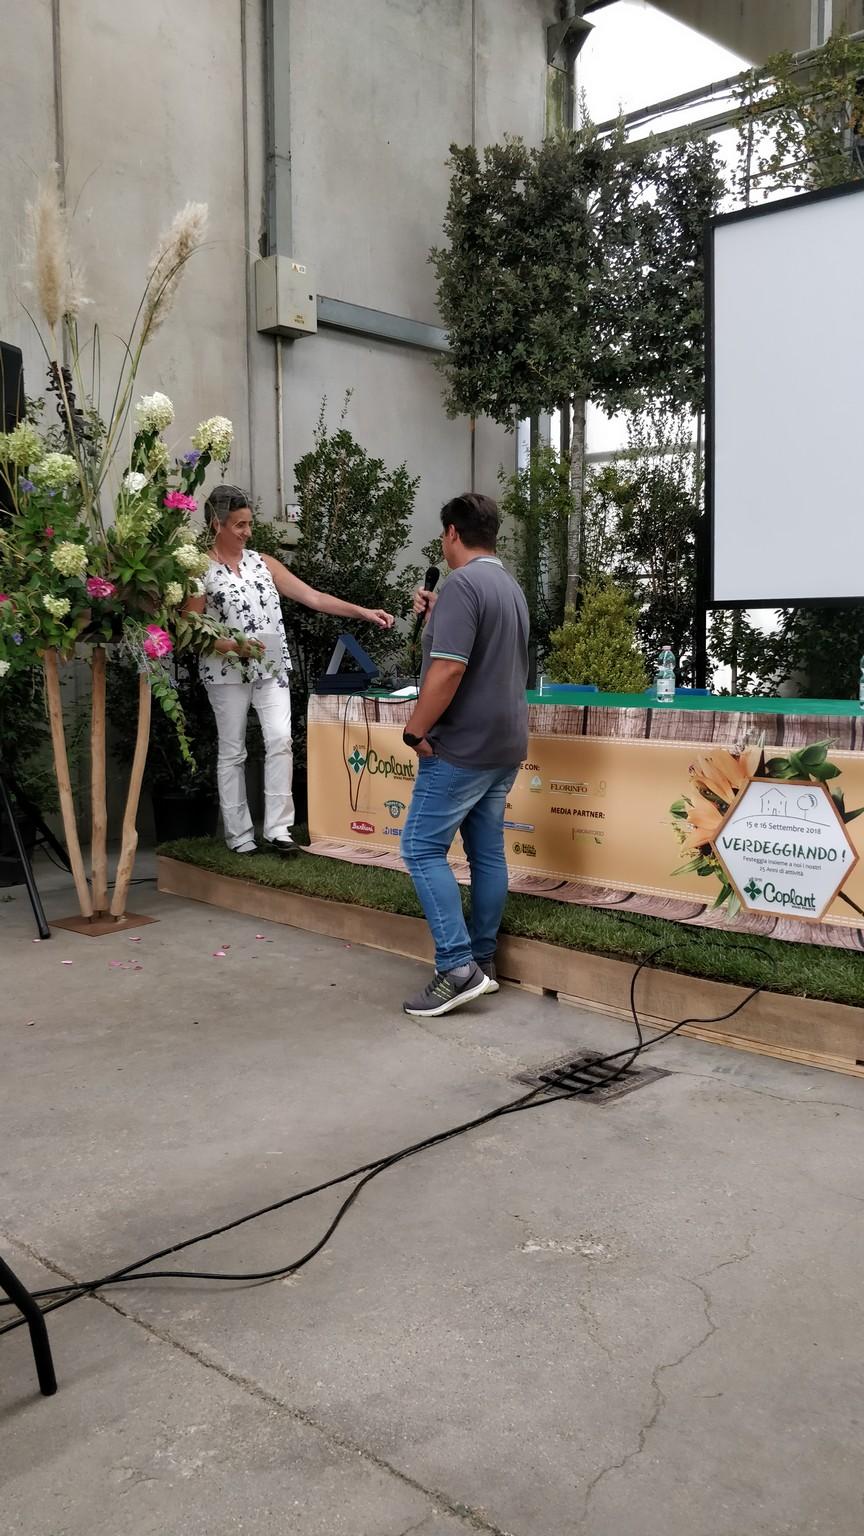 Verdeggiando 2018 Coplant_100